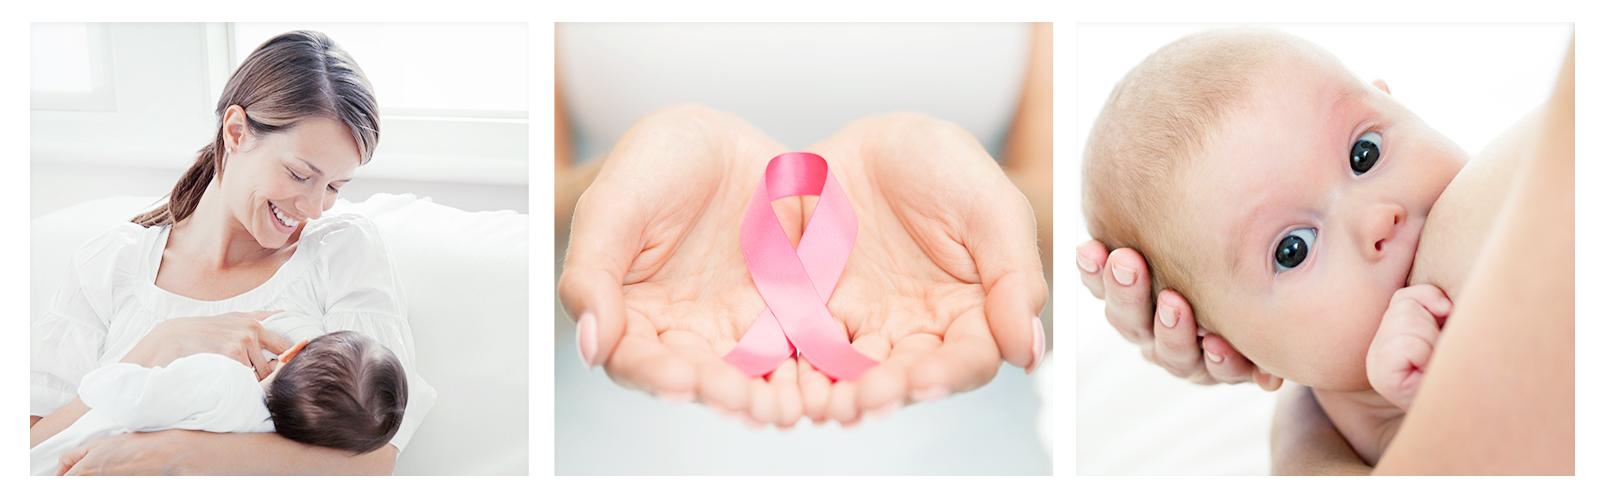 Lactancia contra el cáncer de mama